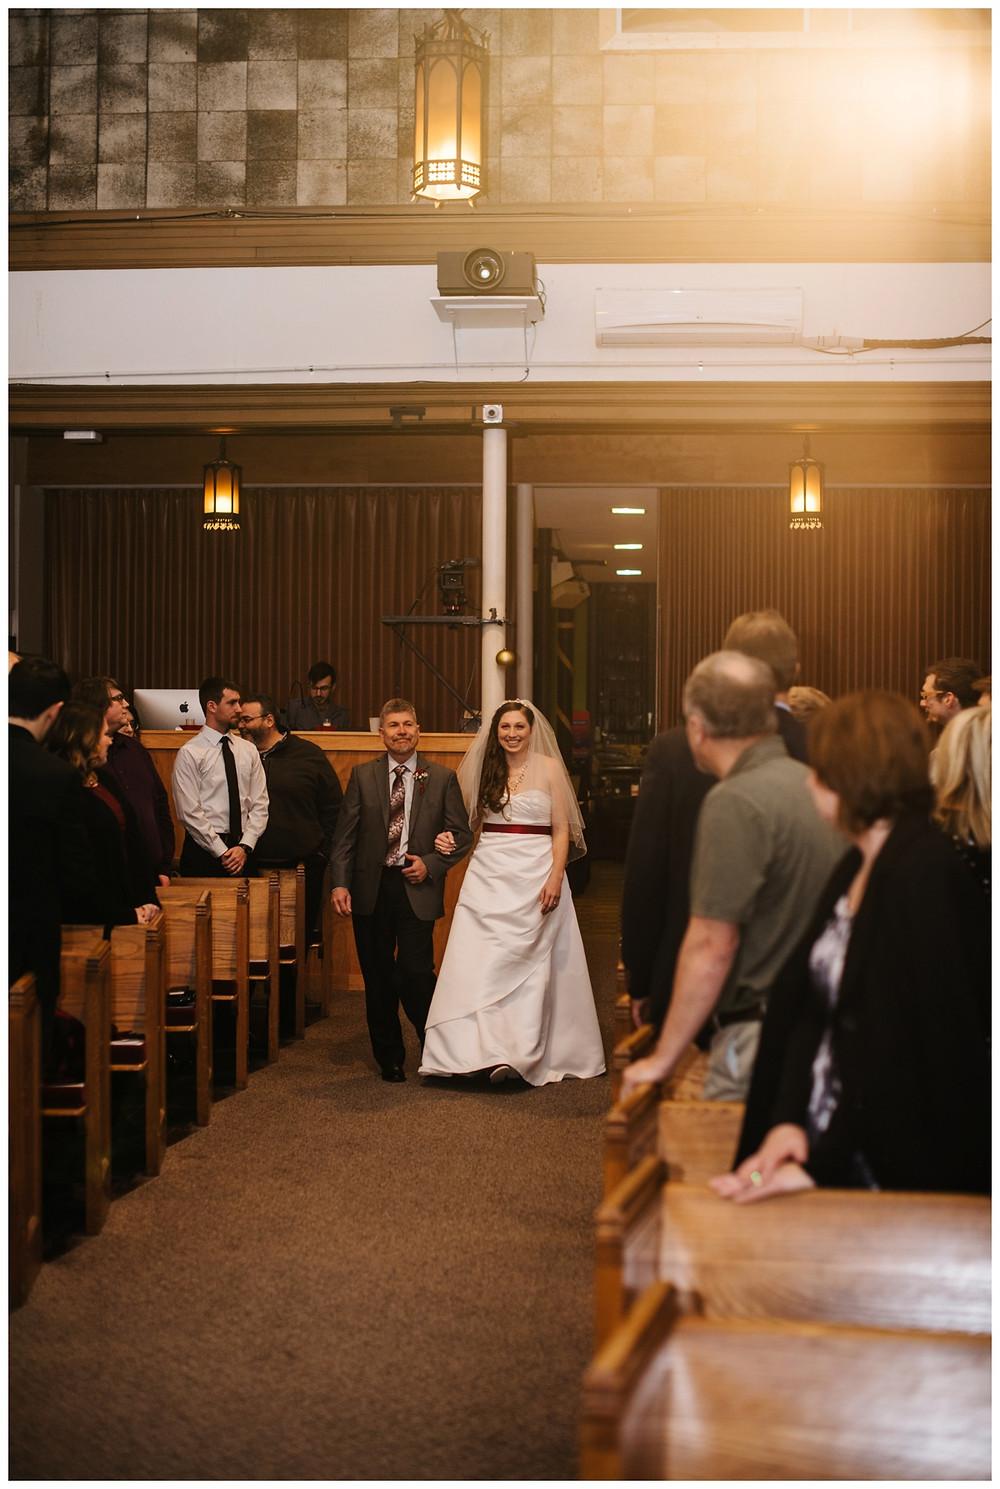 bride-walking-down-aisle-at-milwaukee-wedding-by-milwaukee-wedding-photographer-kyra-rane-photographer